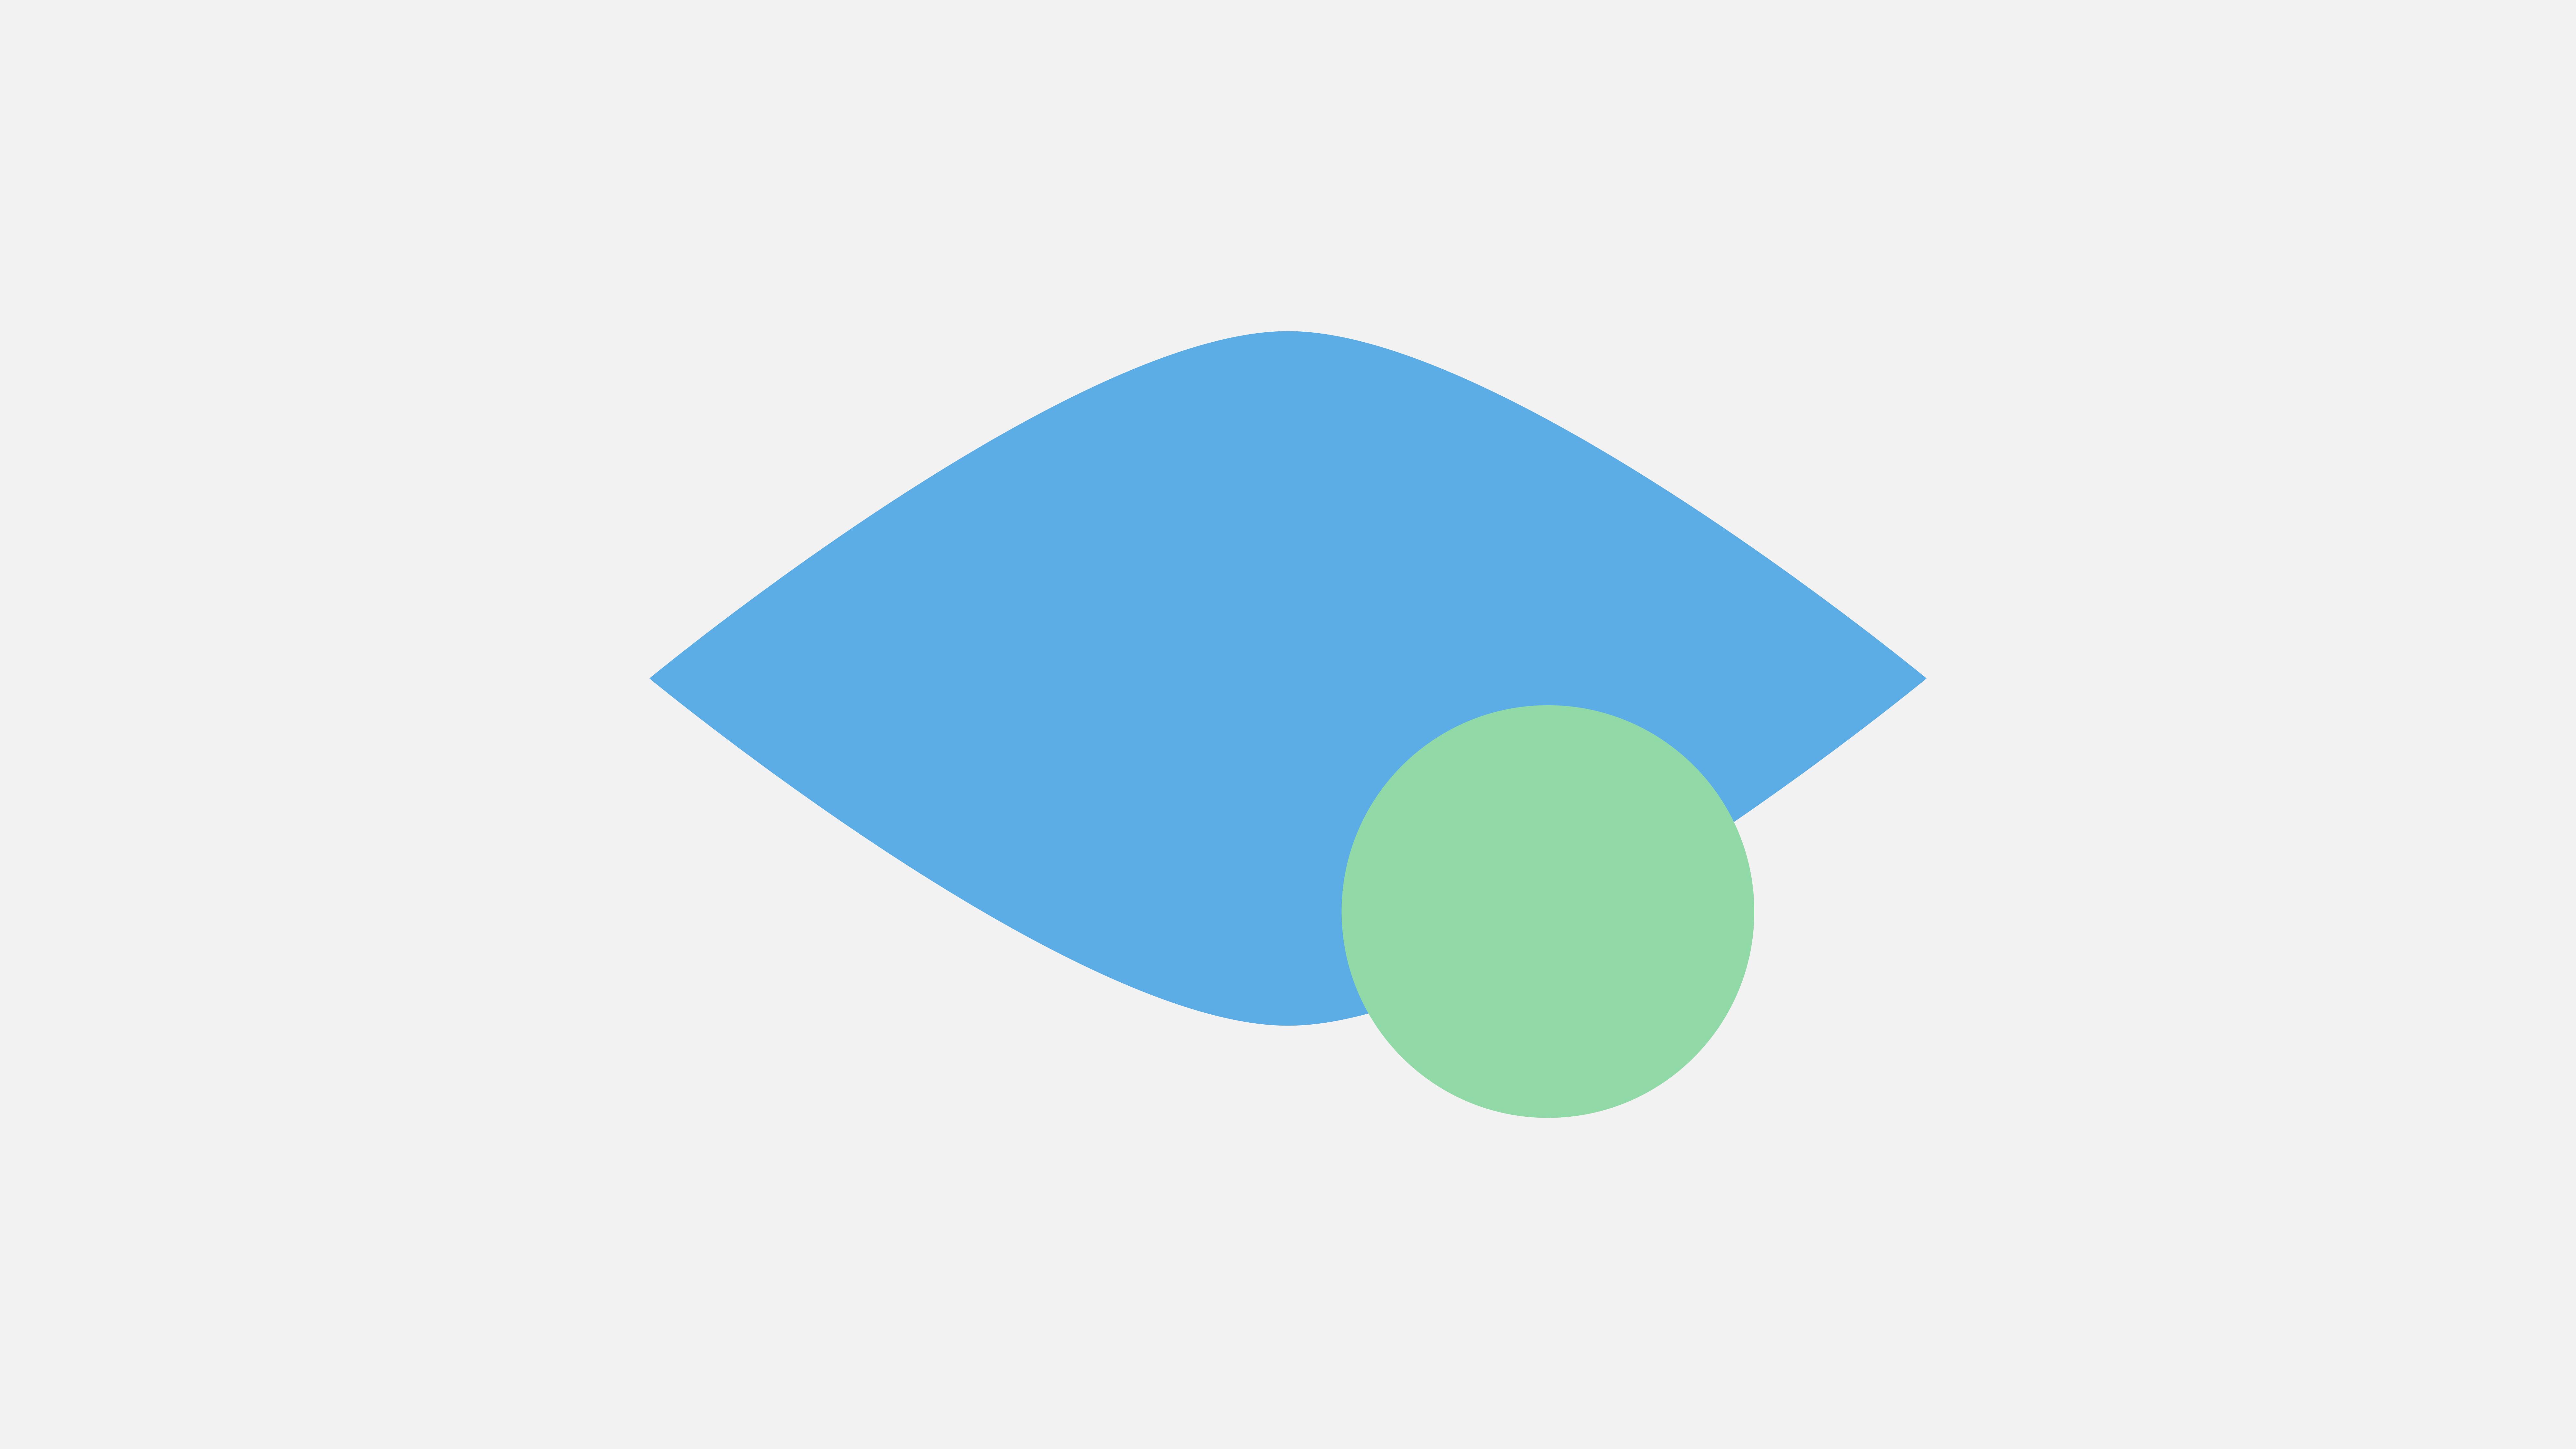 TessHeinricks_Block_Shapes_3